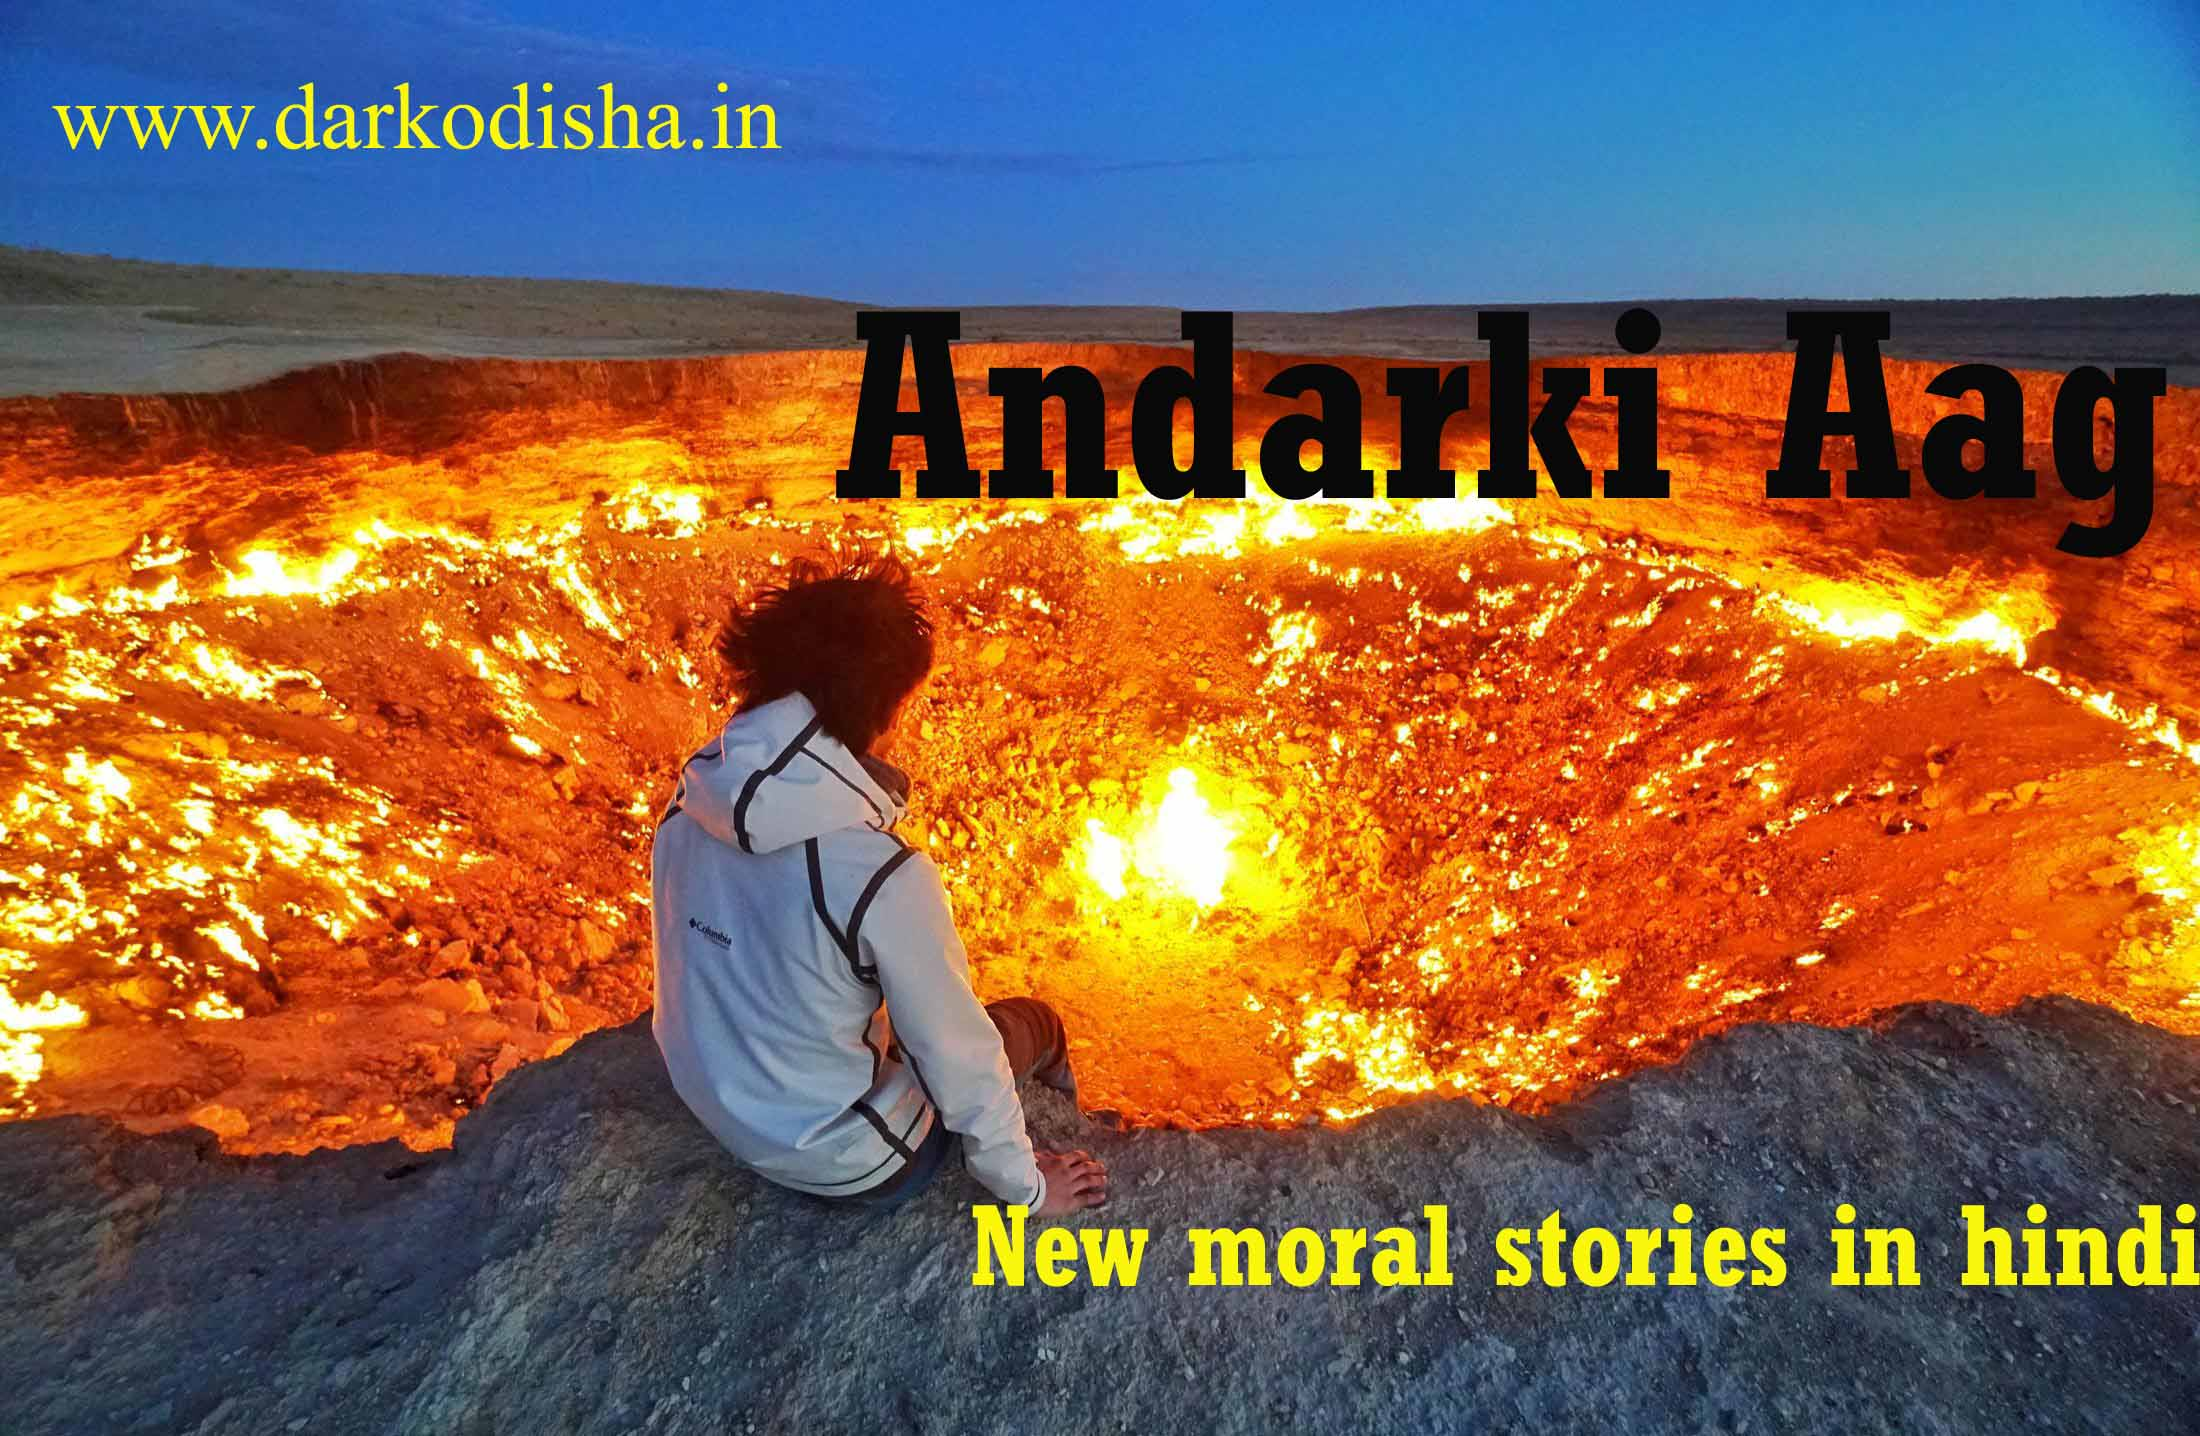 New Moral Stories In Hindi Andarki Aag